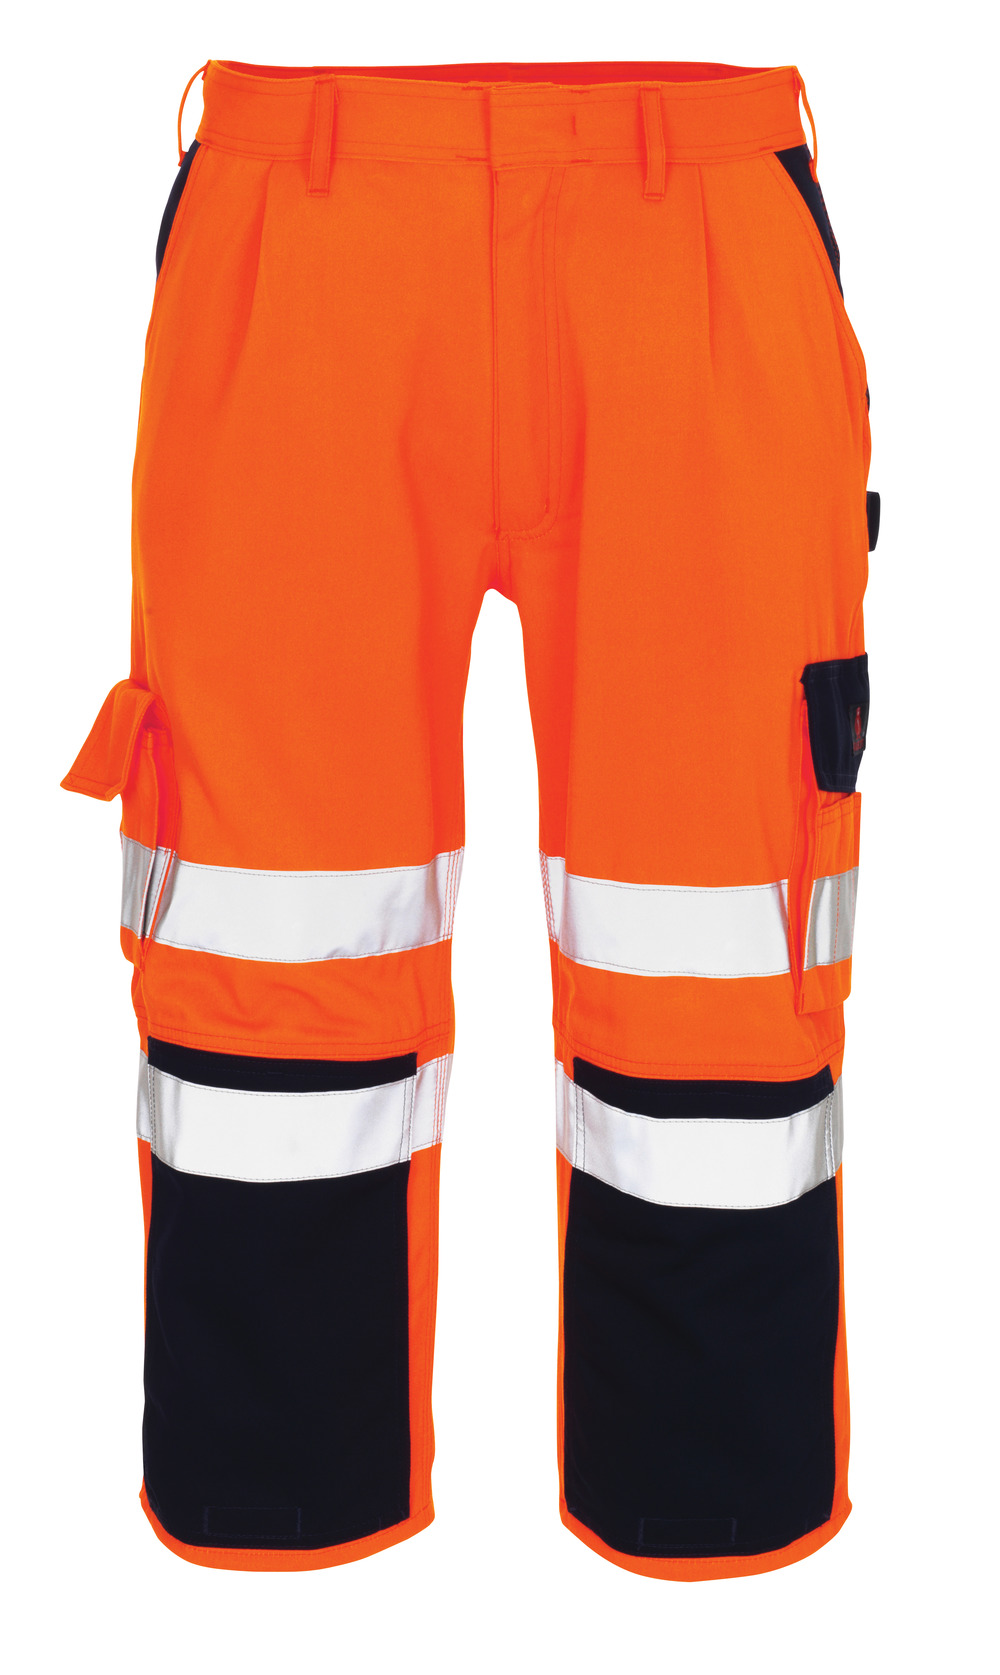 07149-860-141 ¾ Length Trousers with kneepad pockets - hi-vis orange/navy